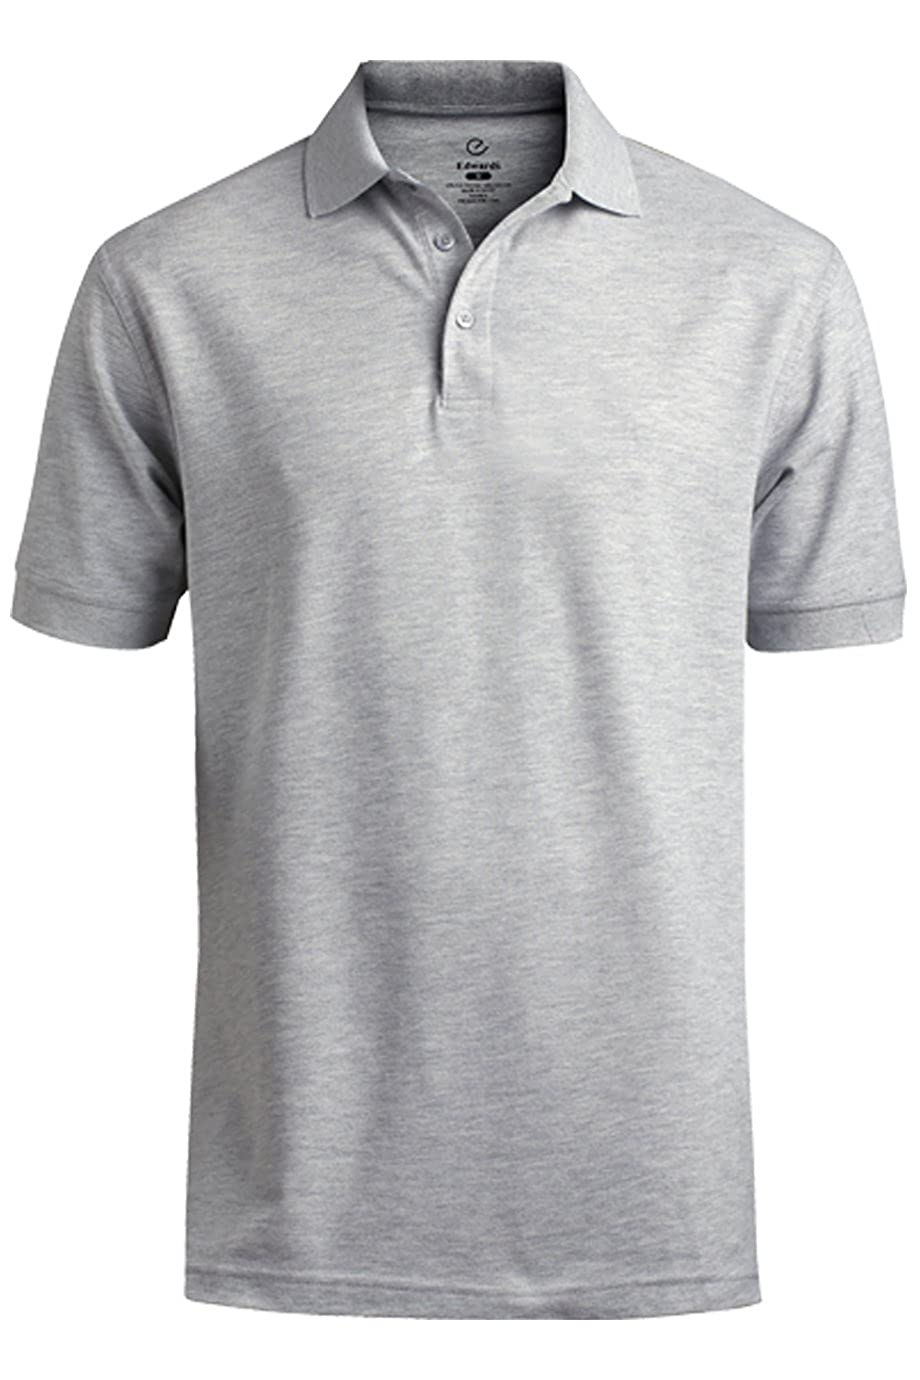 Edwards Garment Mens Big And Tall Soft Pique Polo Shirt/_HEATHER GREY/_Medium